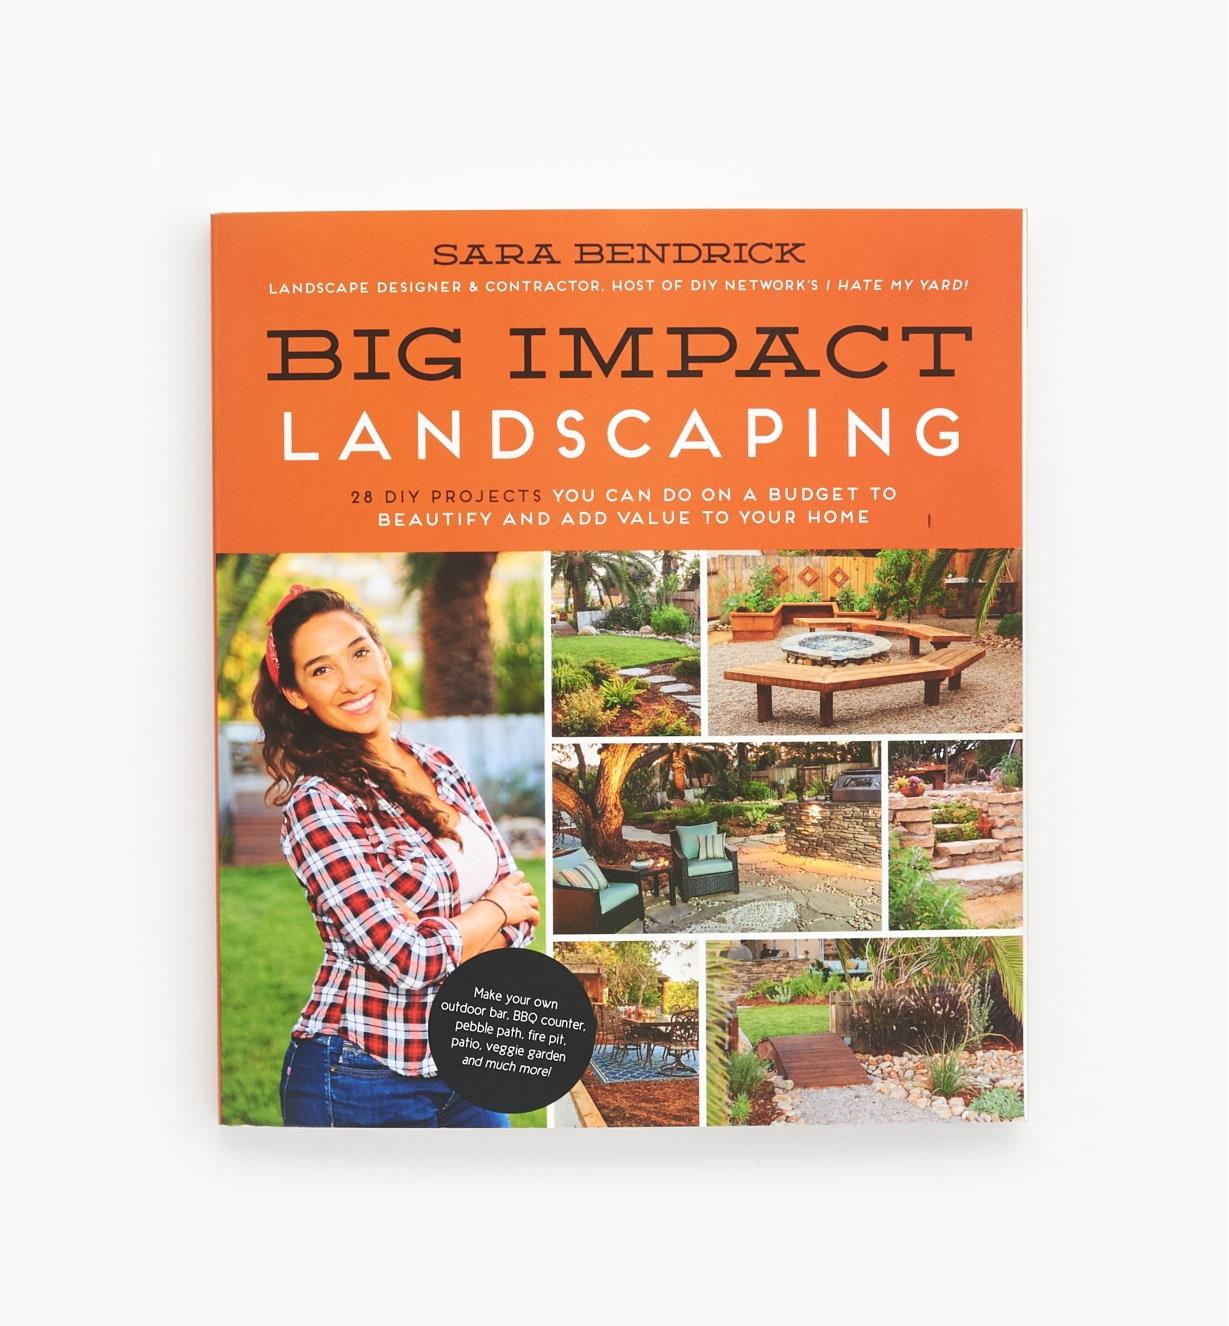 LA619 - Big Impact Landscaping